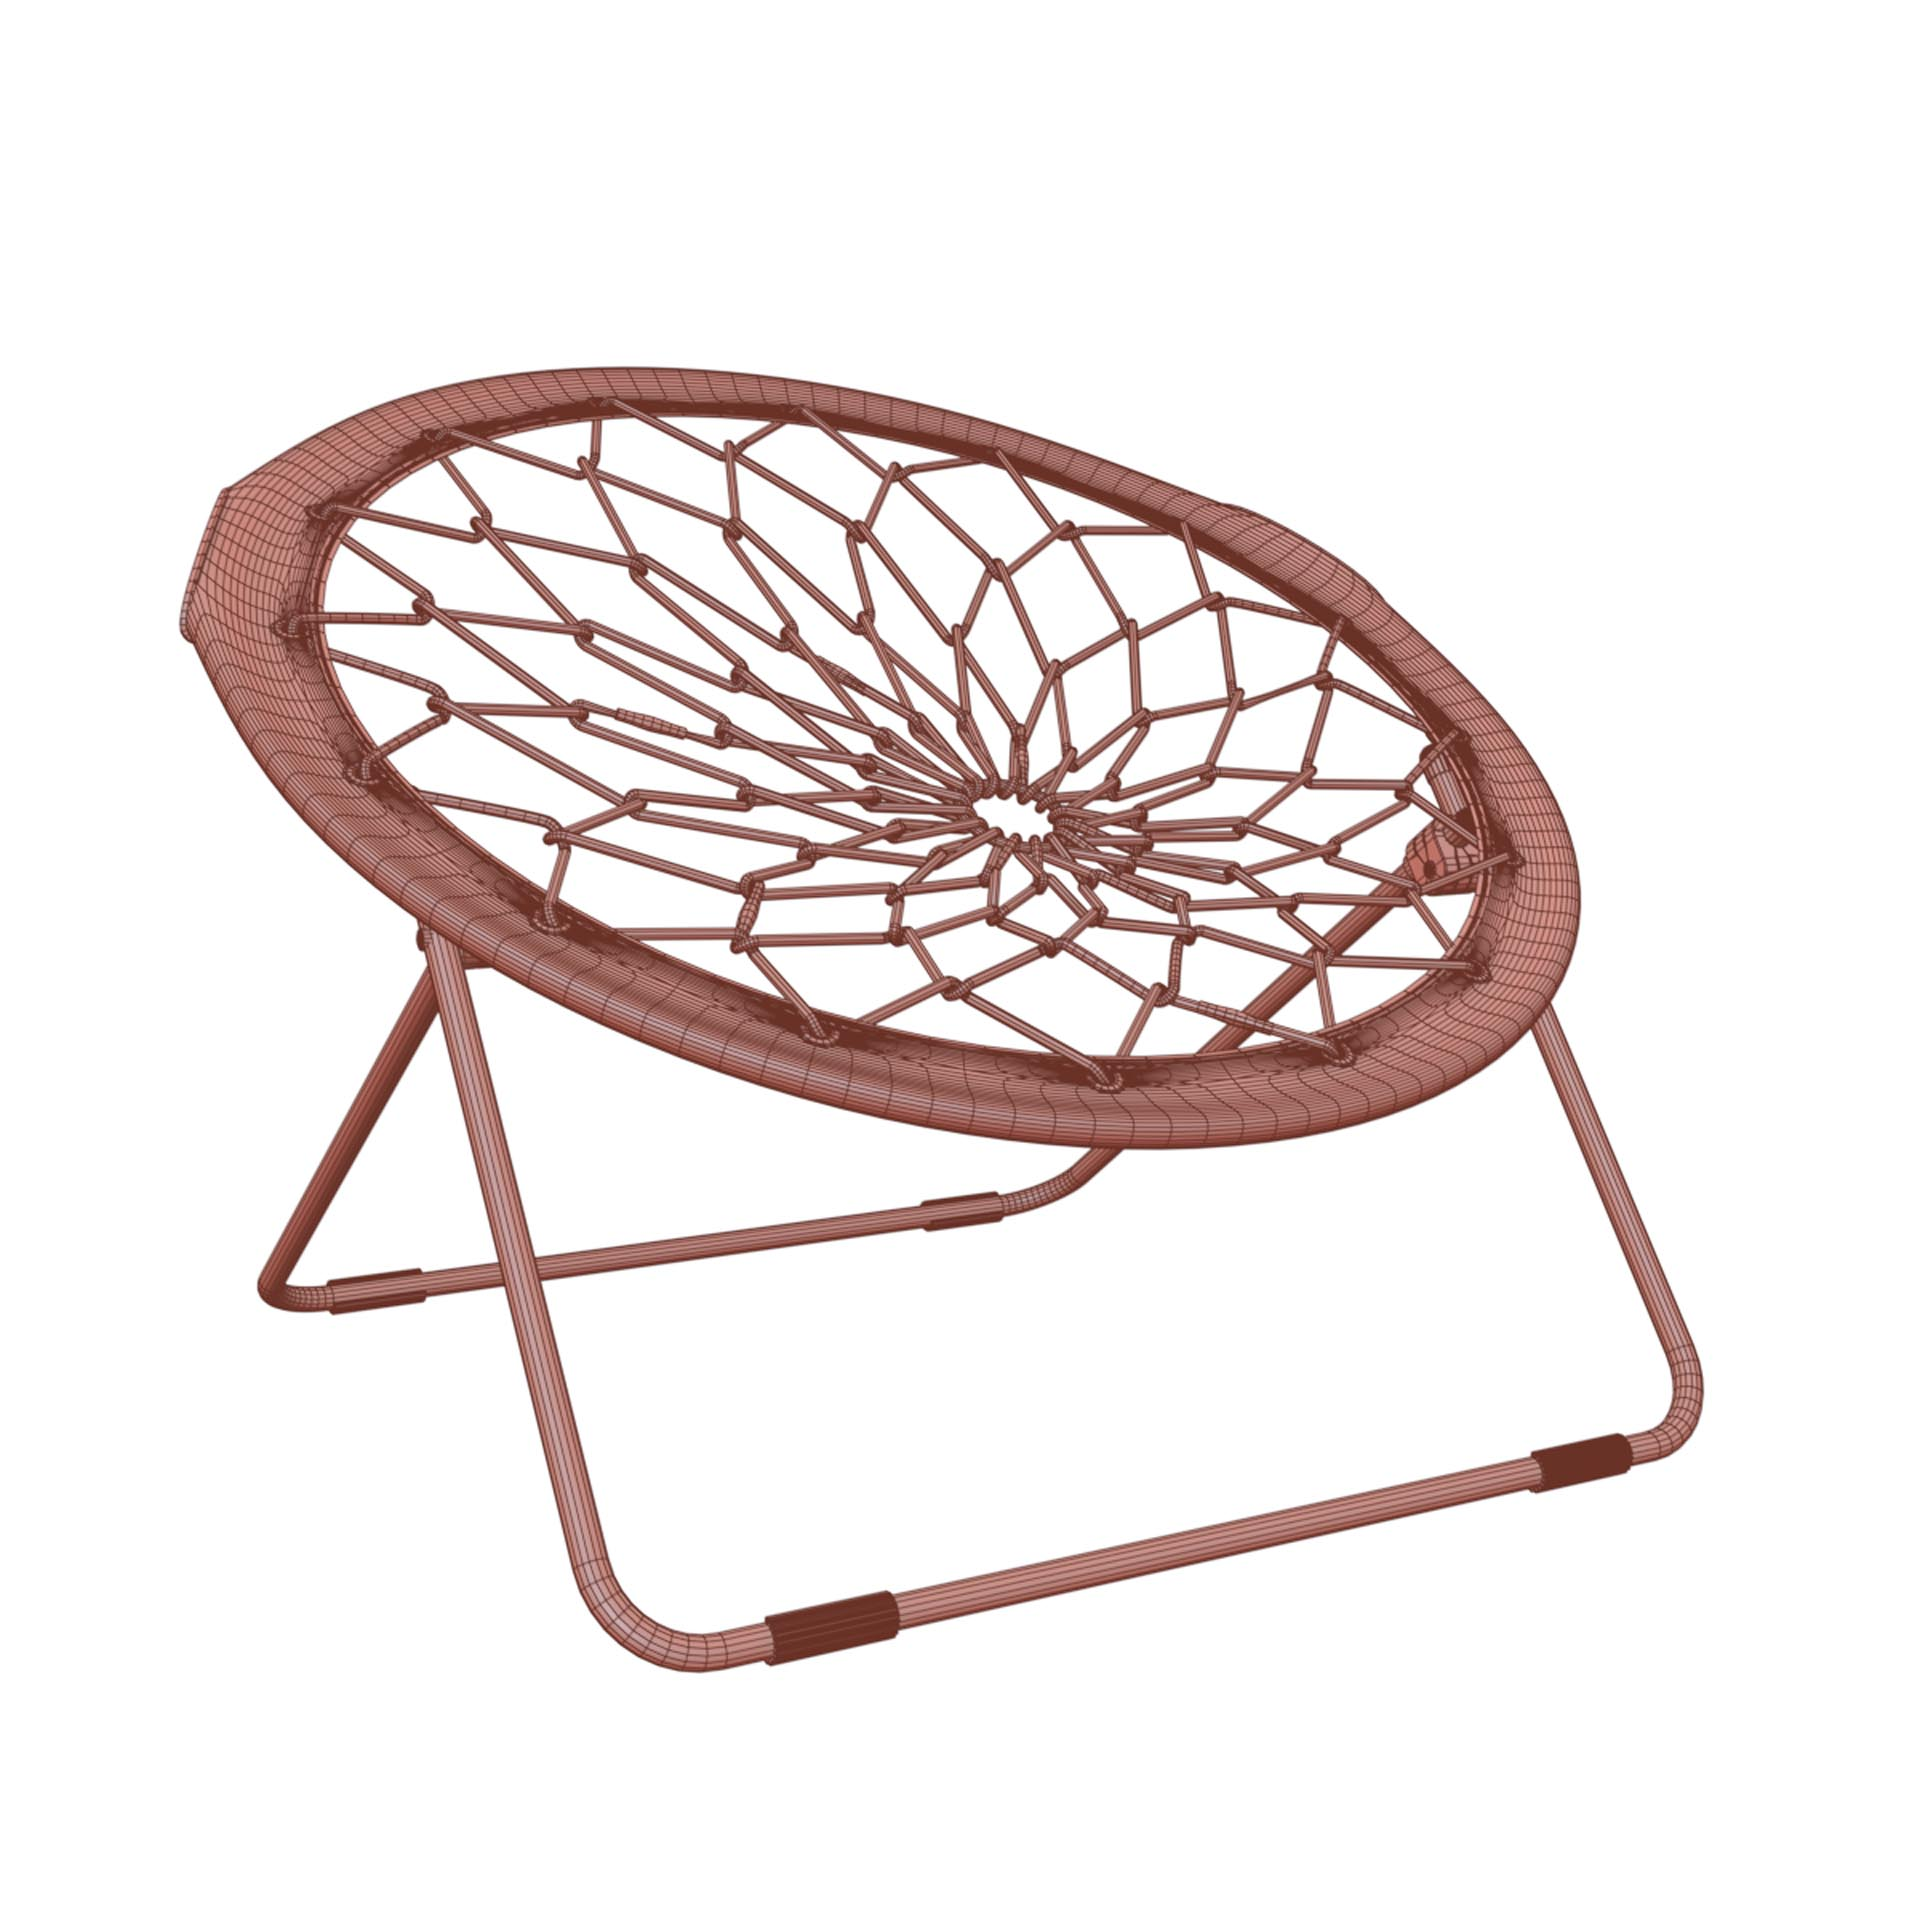 bungee chair amazon doll hair salon fresh bunge rtty1